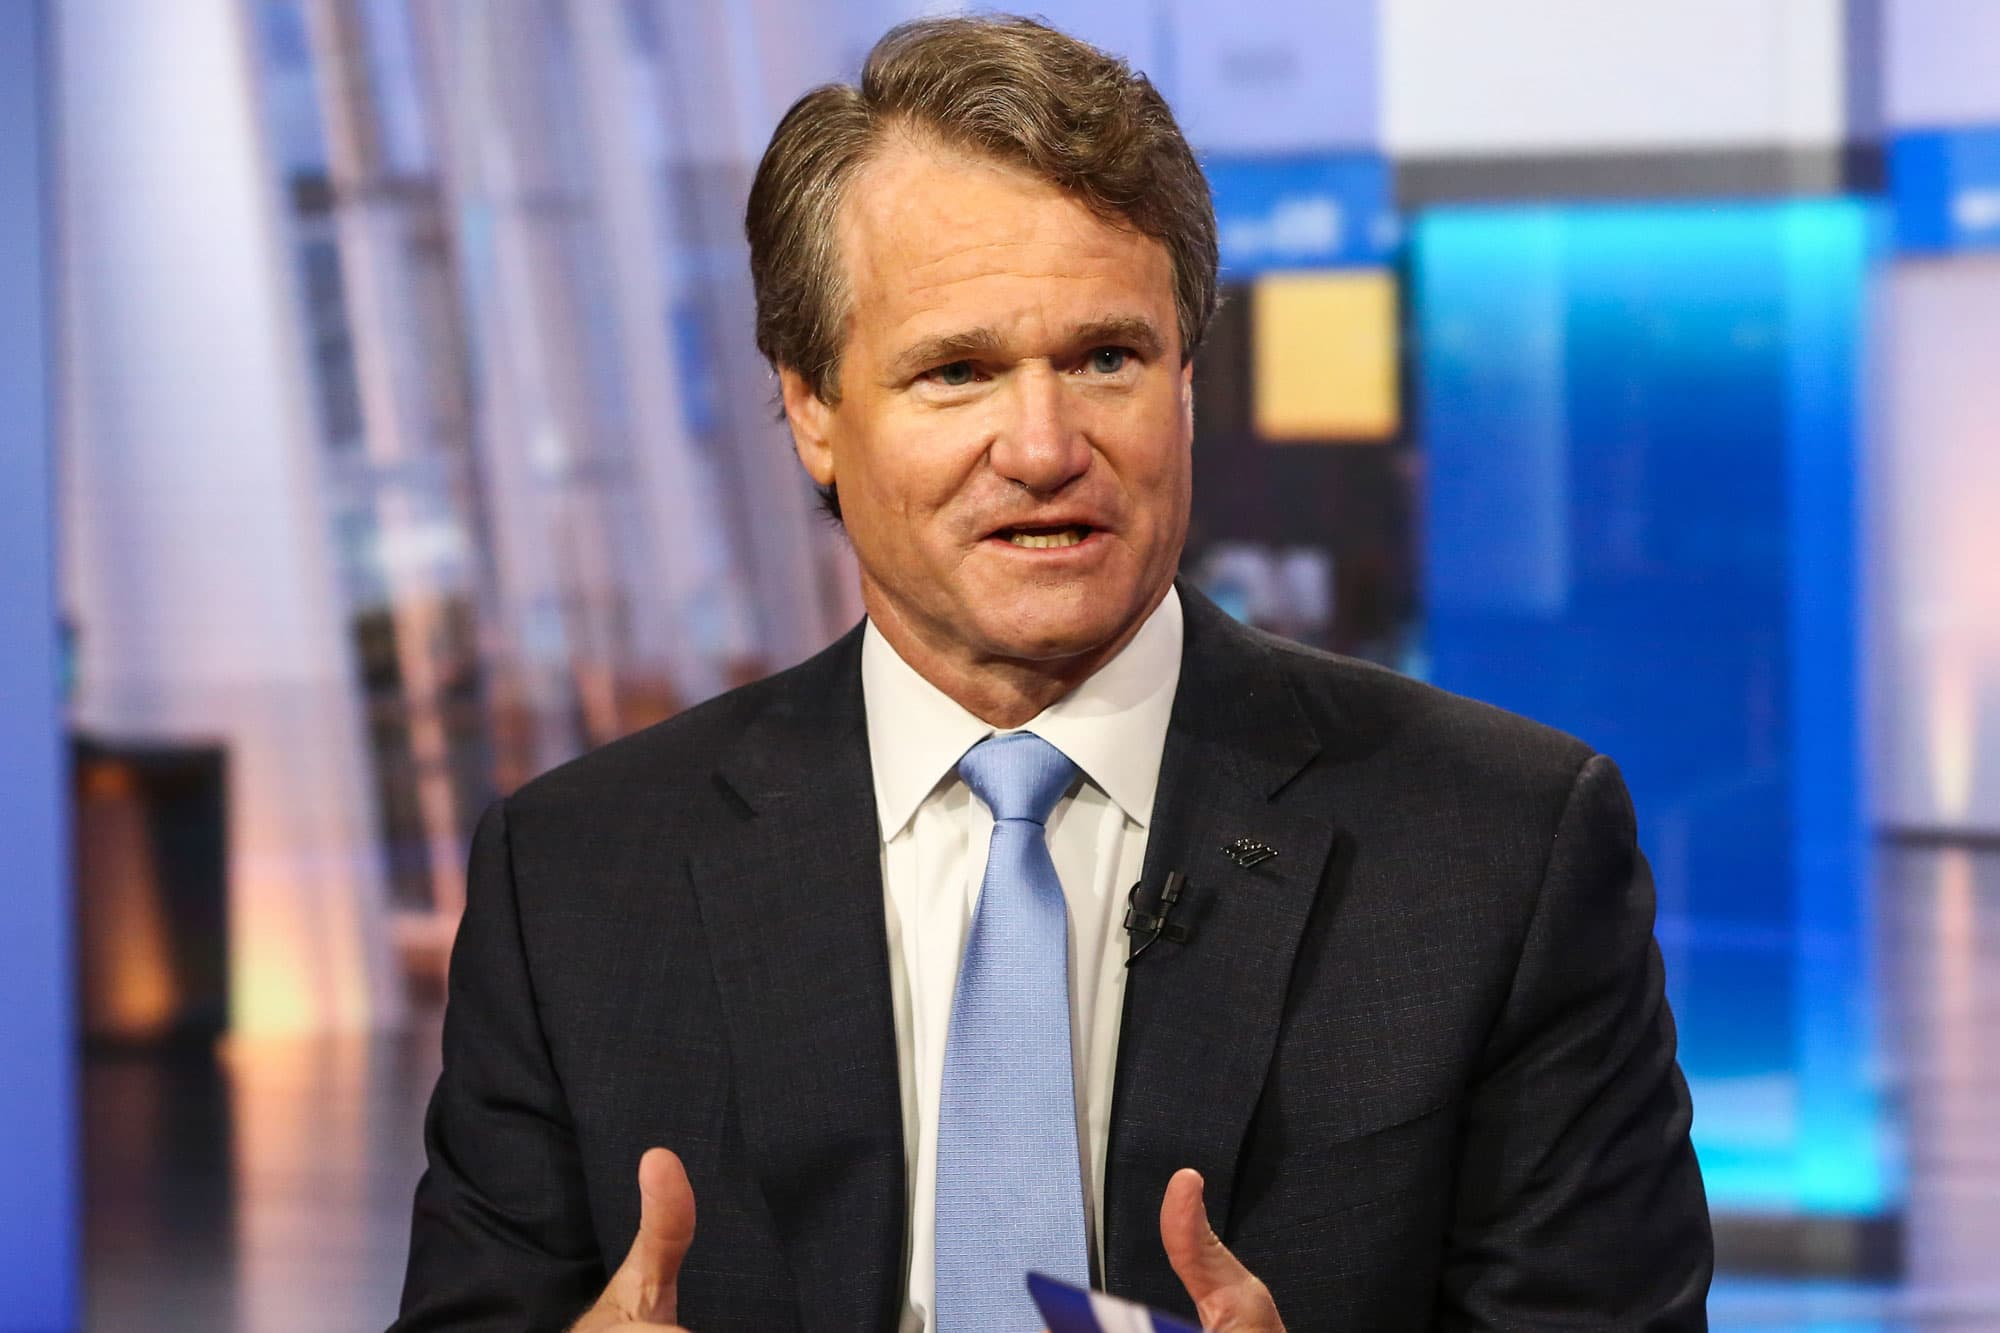 BofA CEO Moynihan gets raise to $26 5 million for record 2018 profit